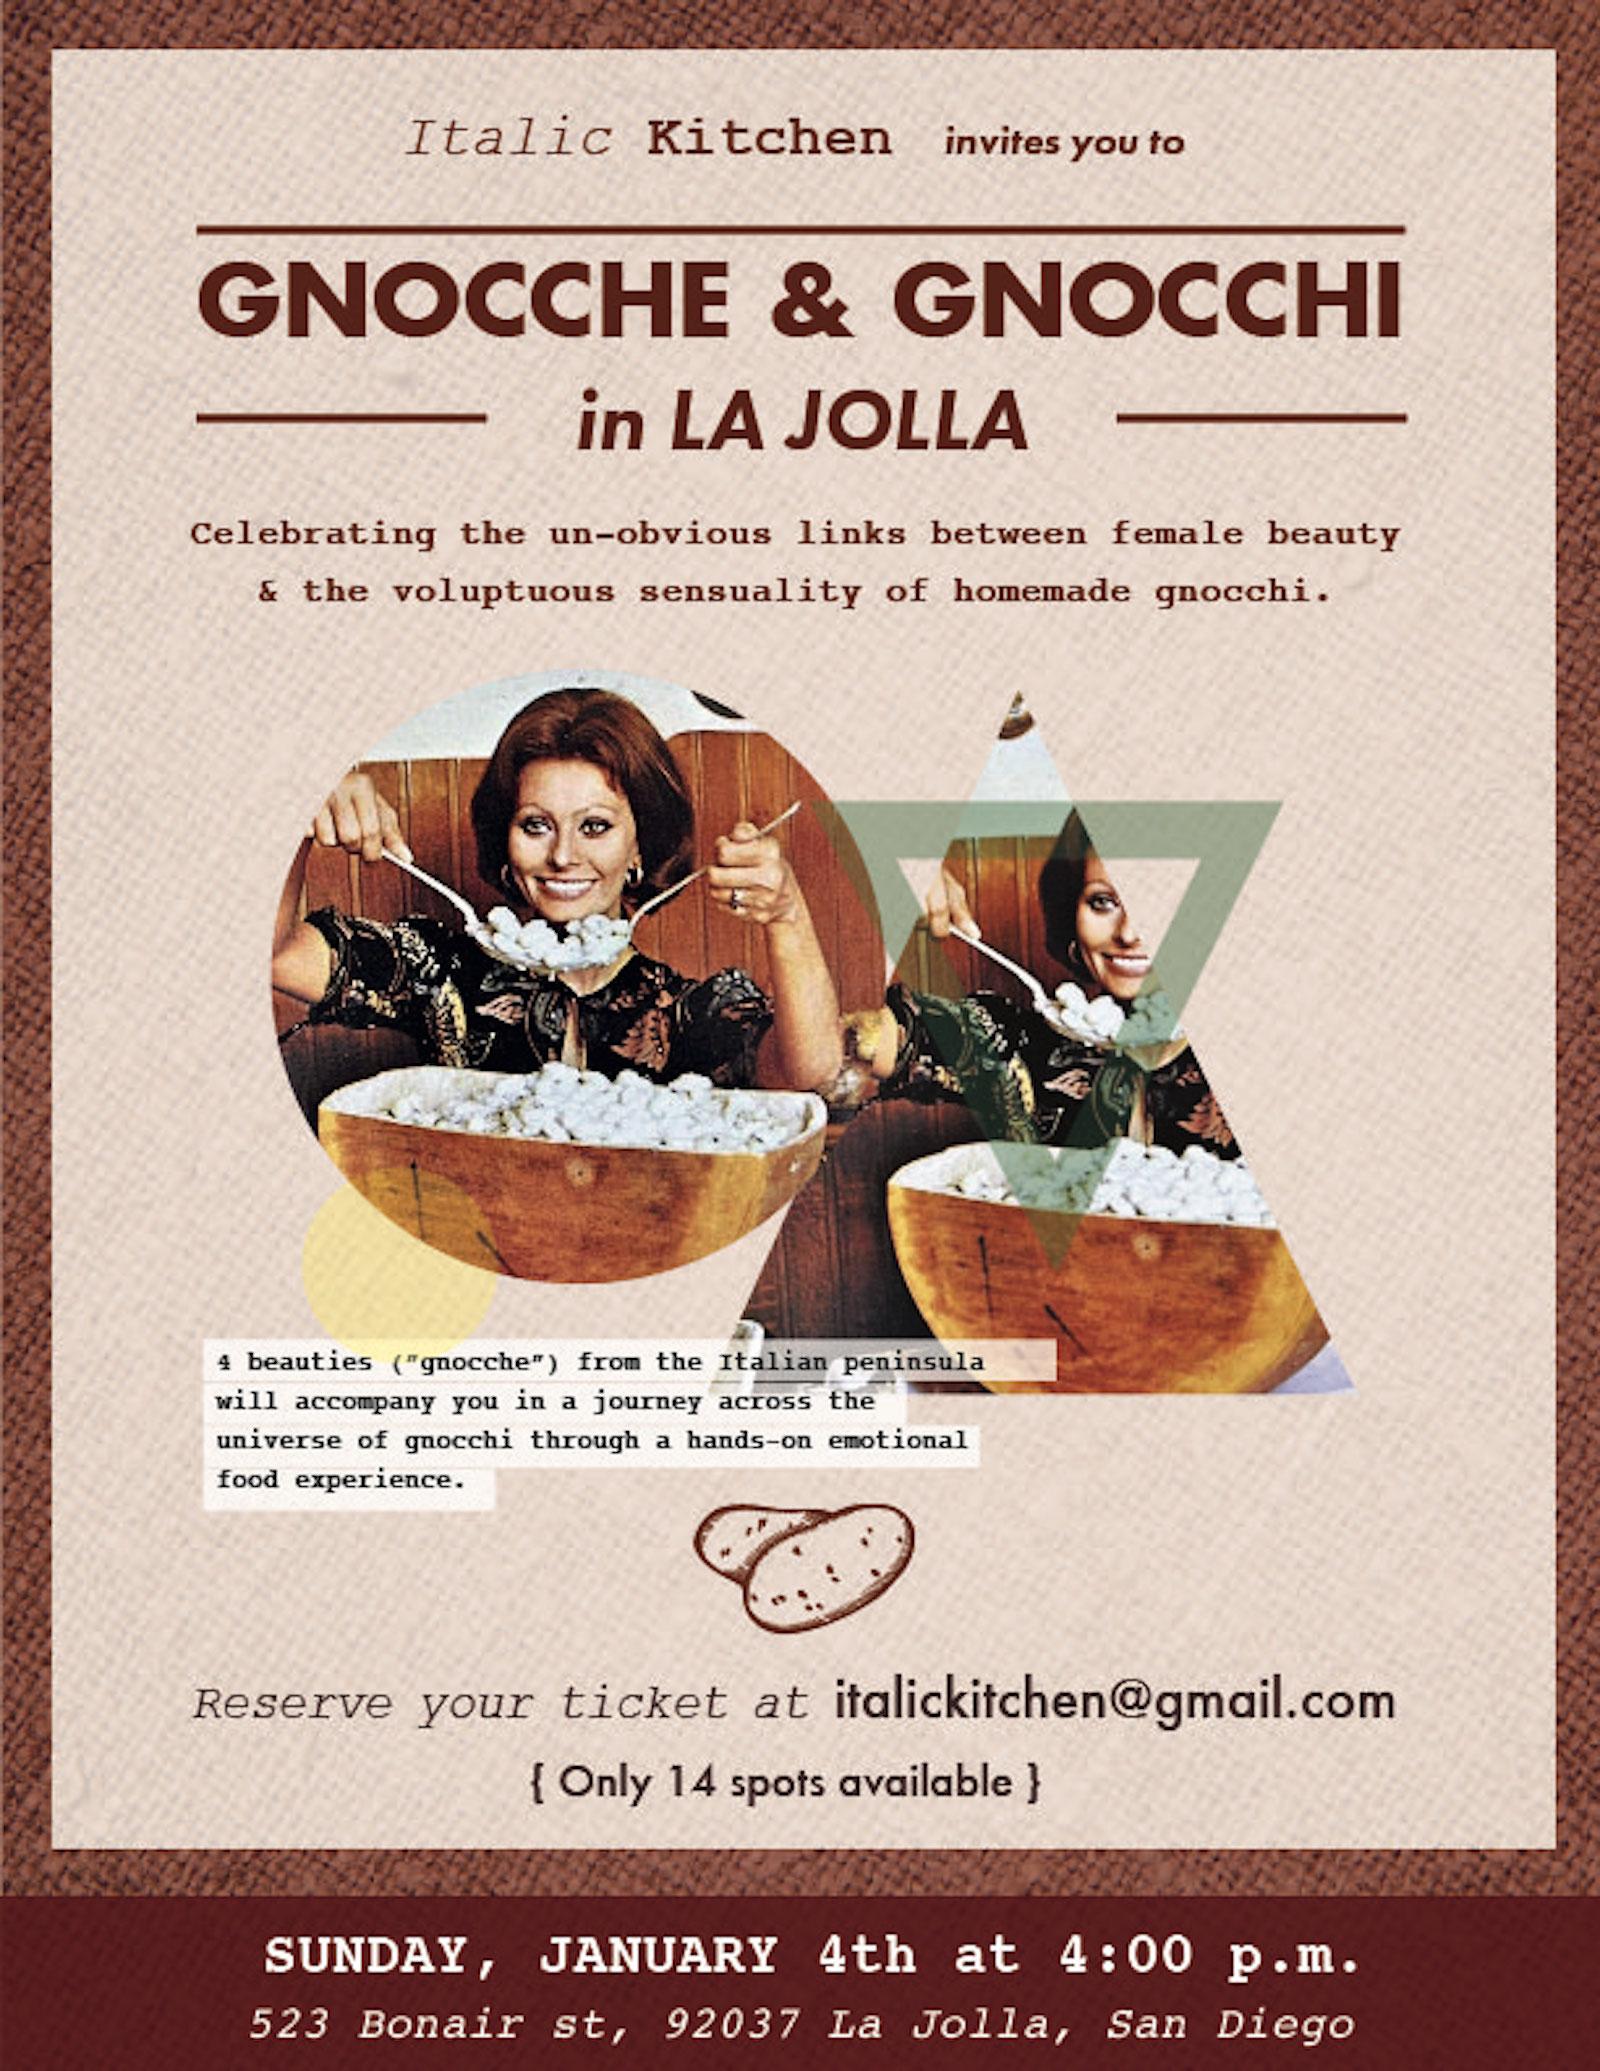 gnocche&gnocchi-01.jpg